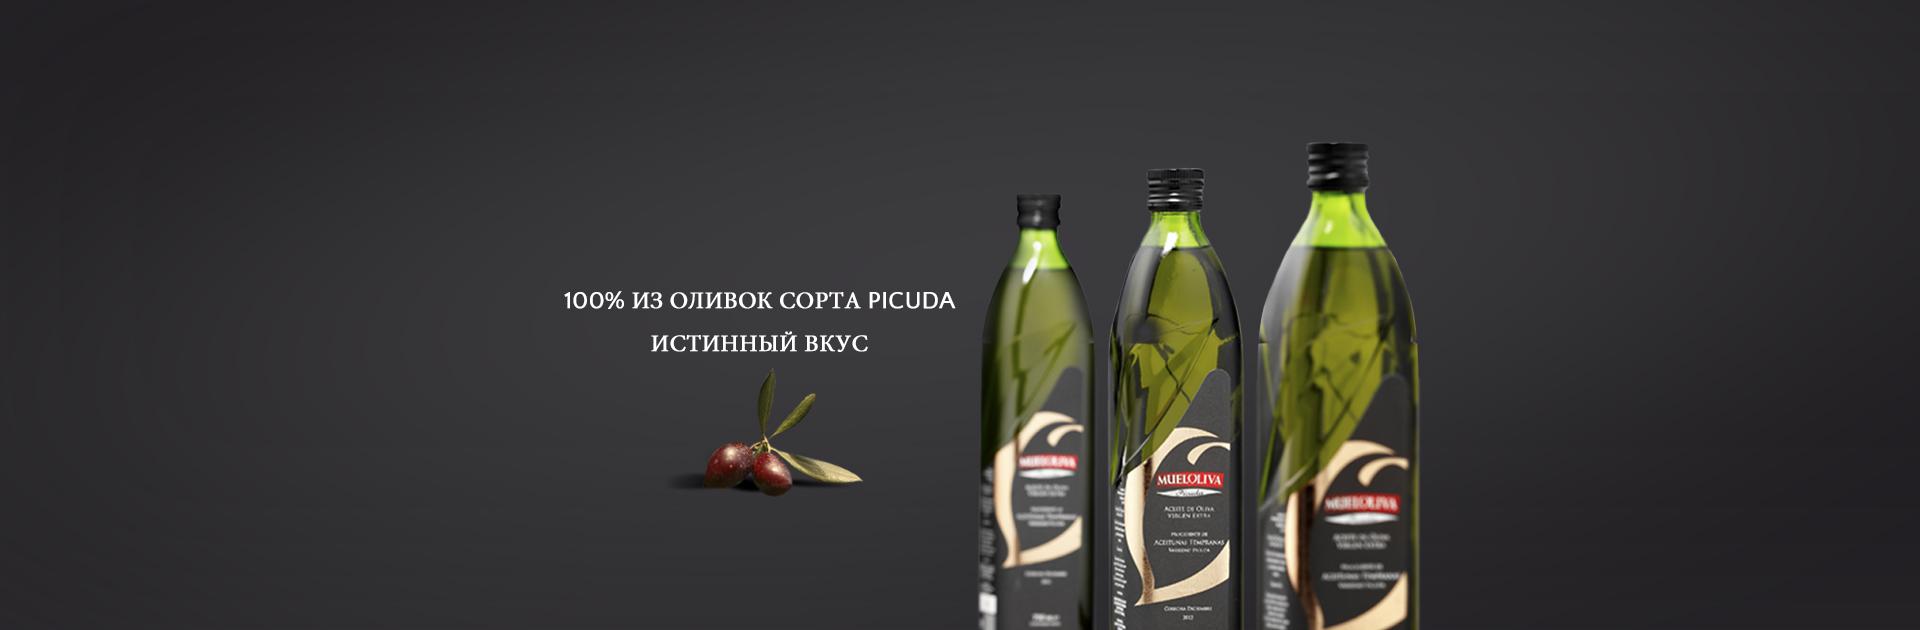 banner-pcuda-ruso-2